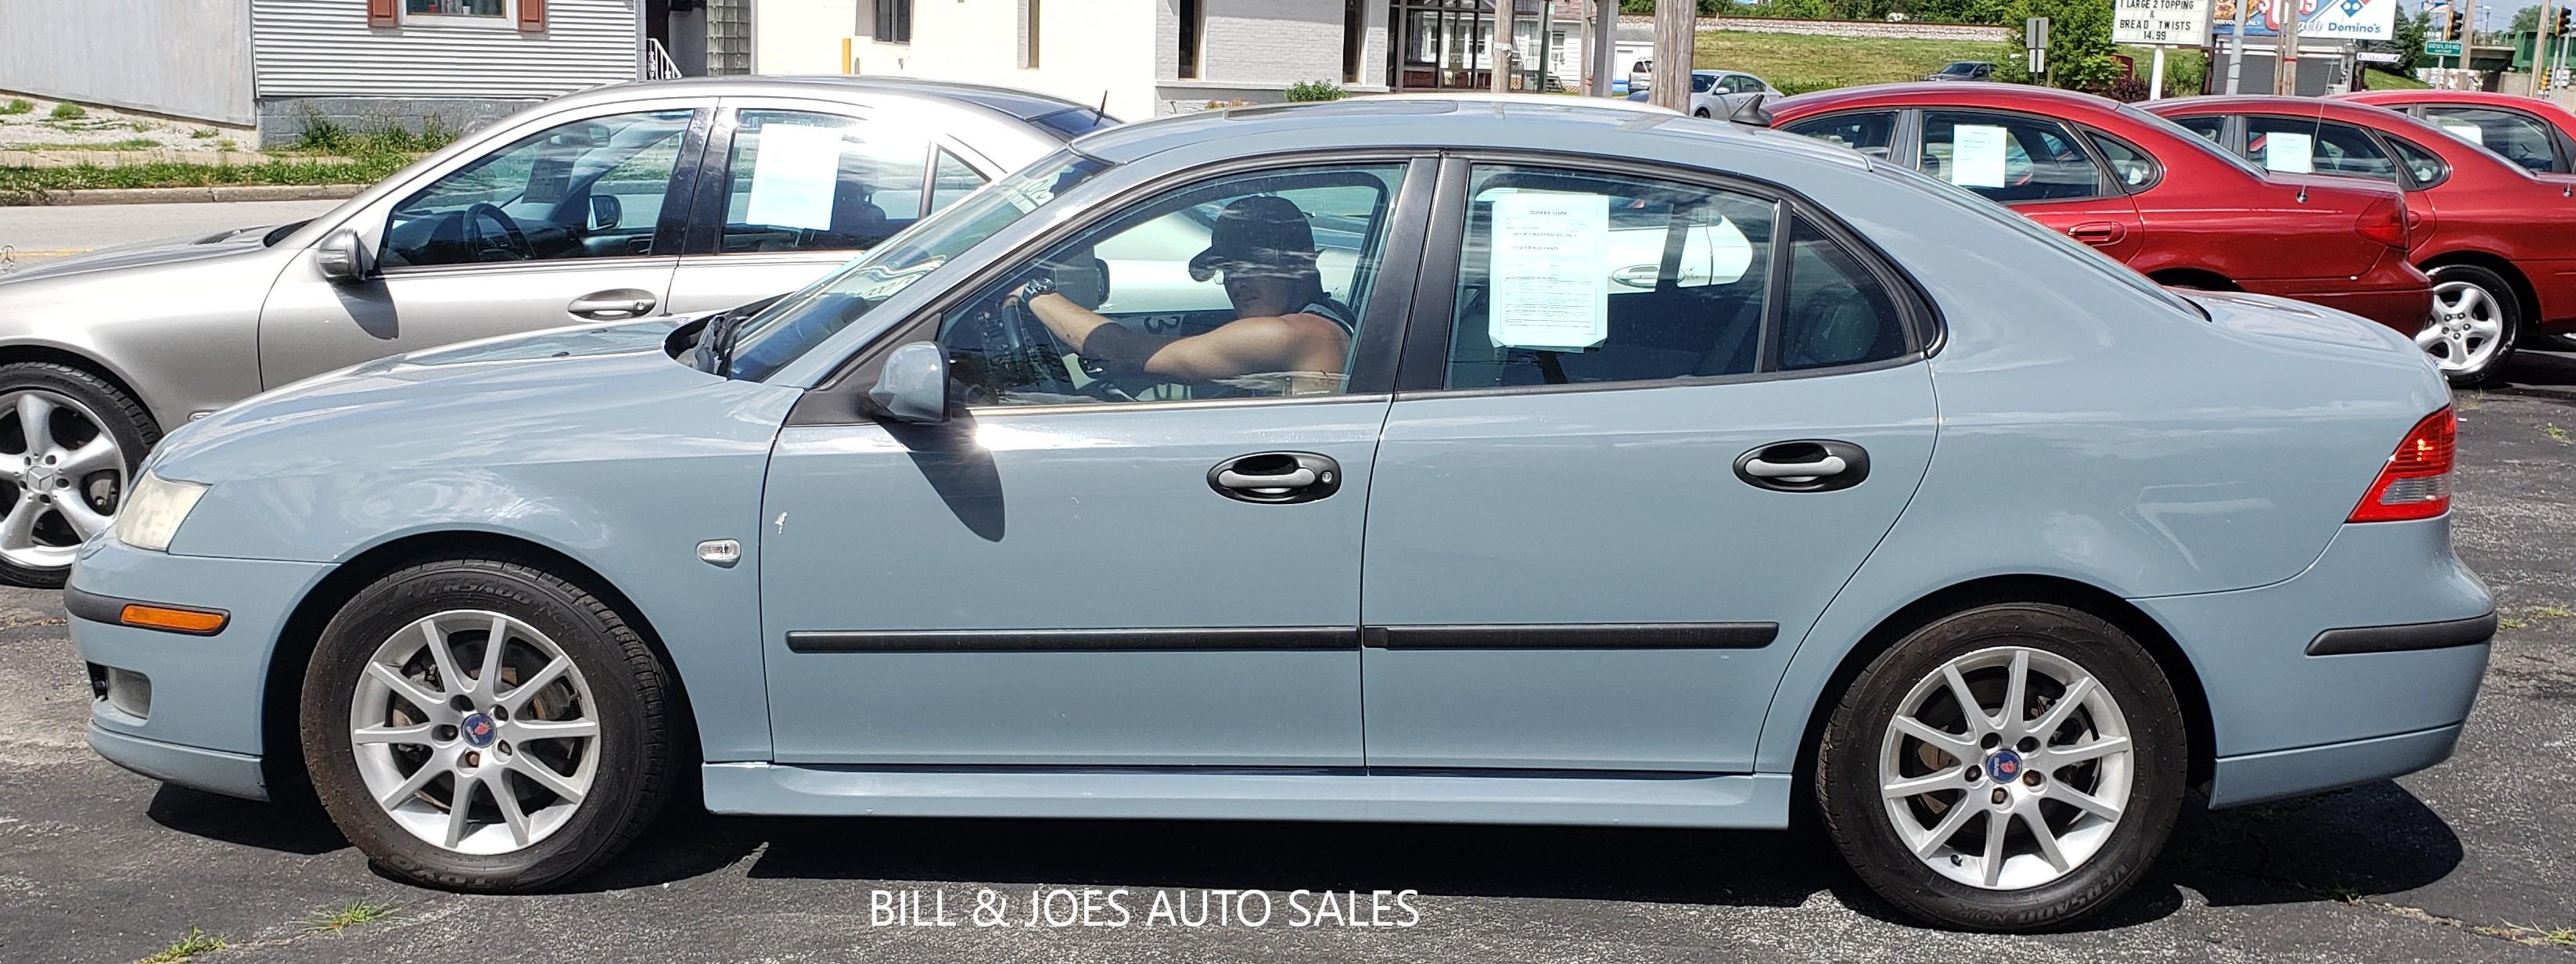 Bill S Auto Sales >> Bill S Auto Sales Best New Car Release 2020